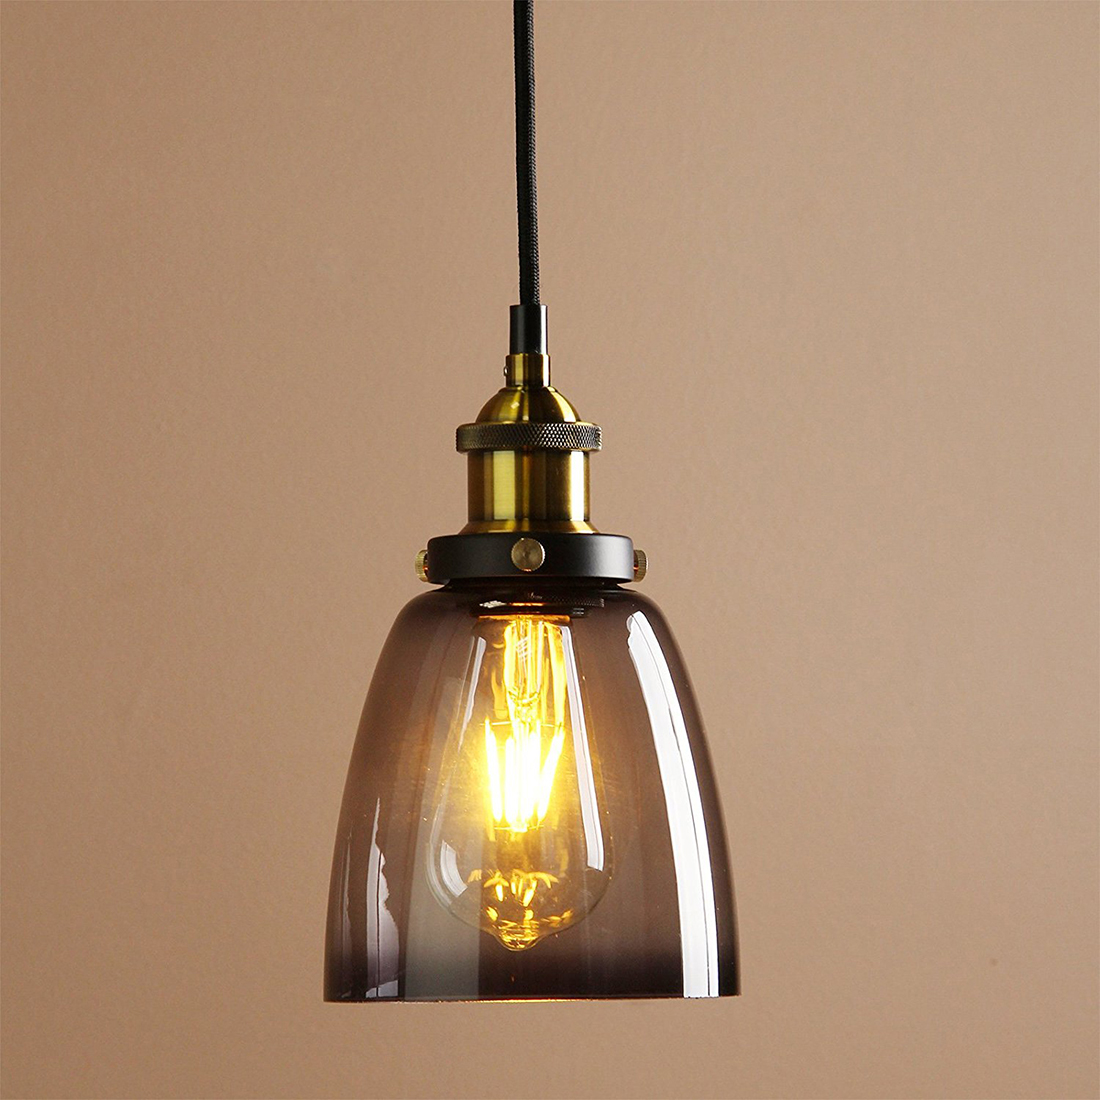 Vintage Industrial Metal Finish Black Gray Glass Shade Retro Ceiling Light Vintage Hanging Light fitting (diameter 14cm glass